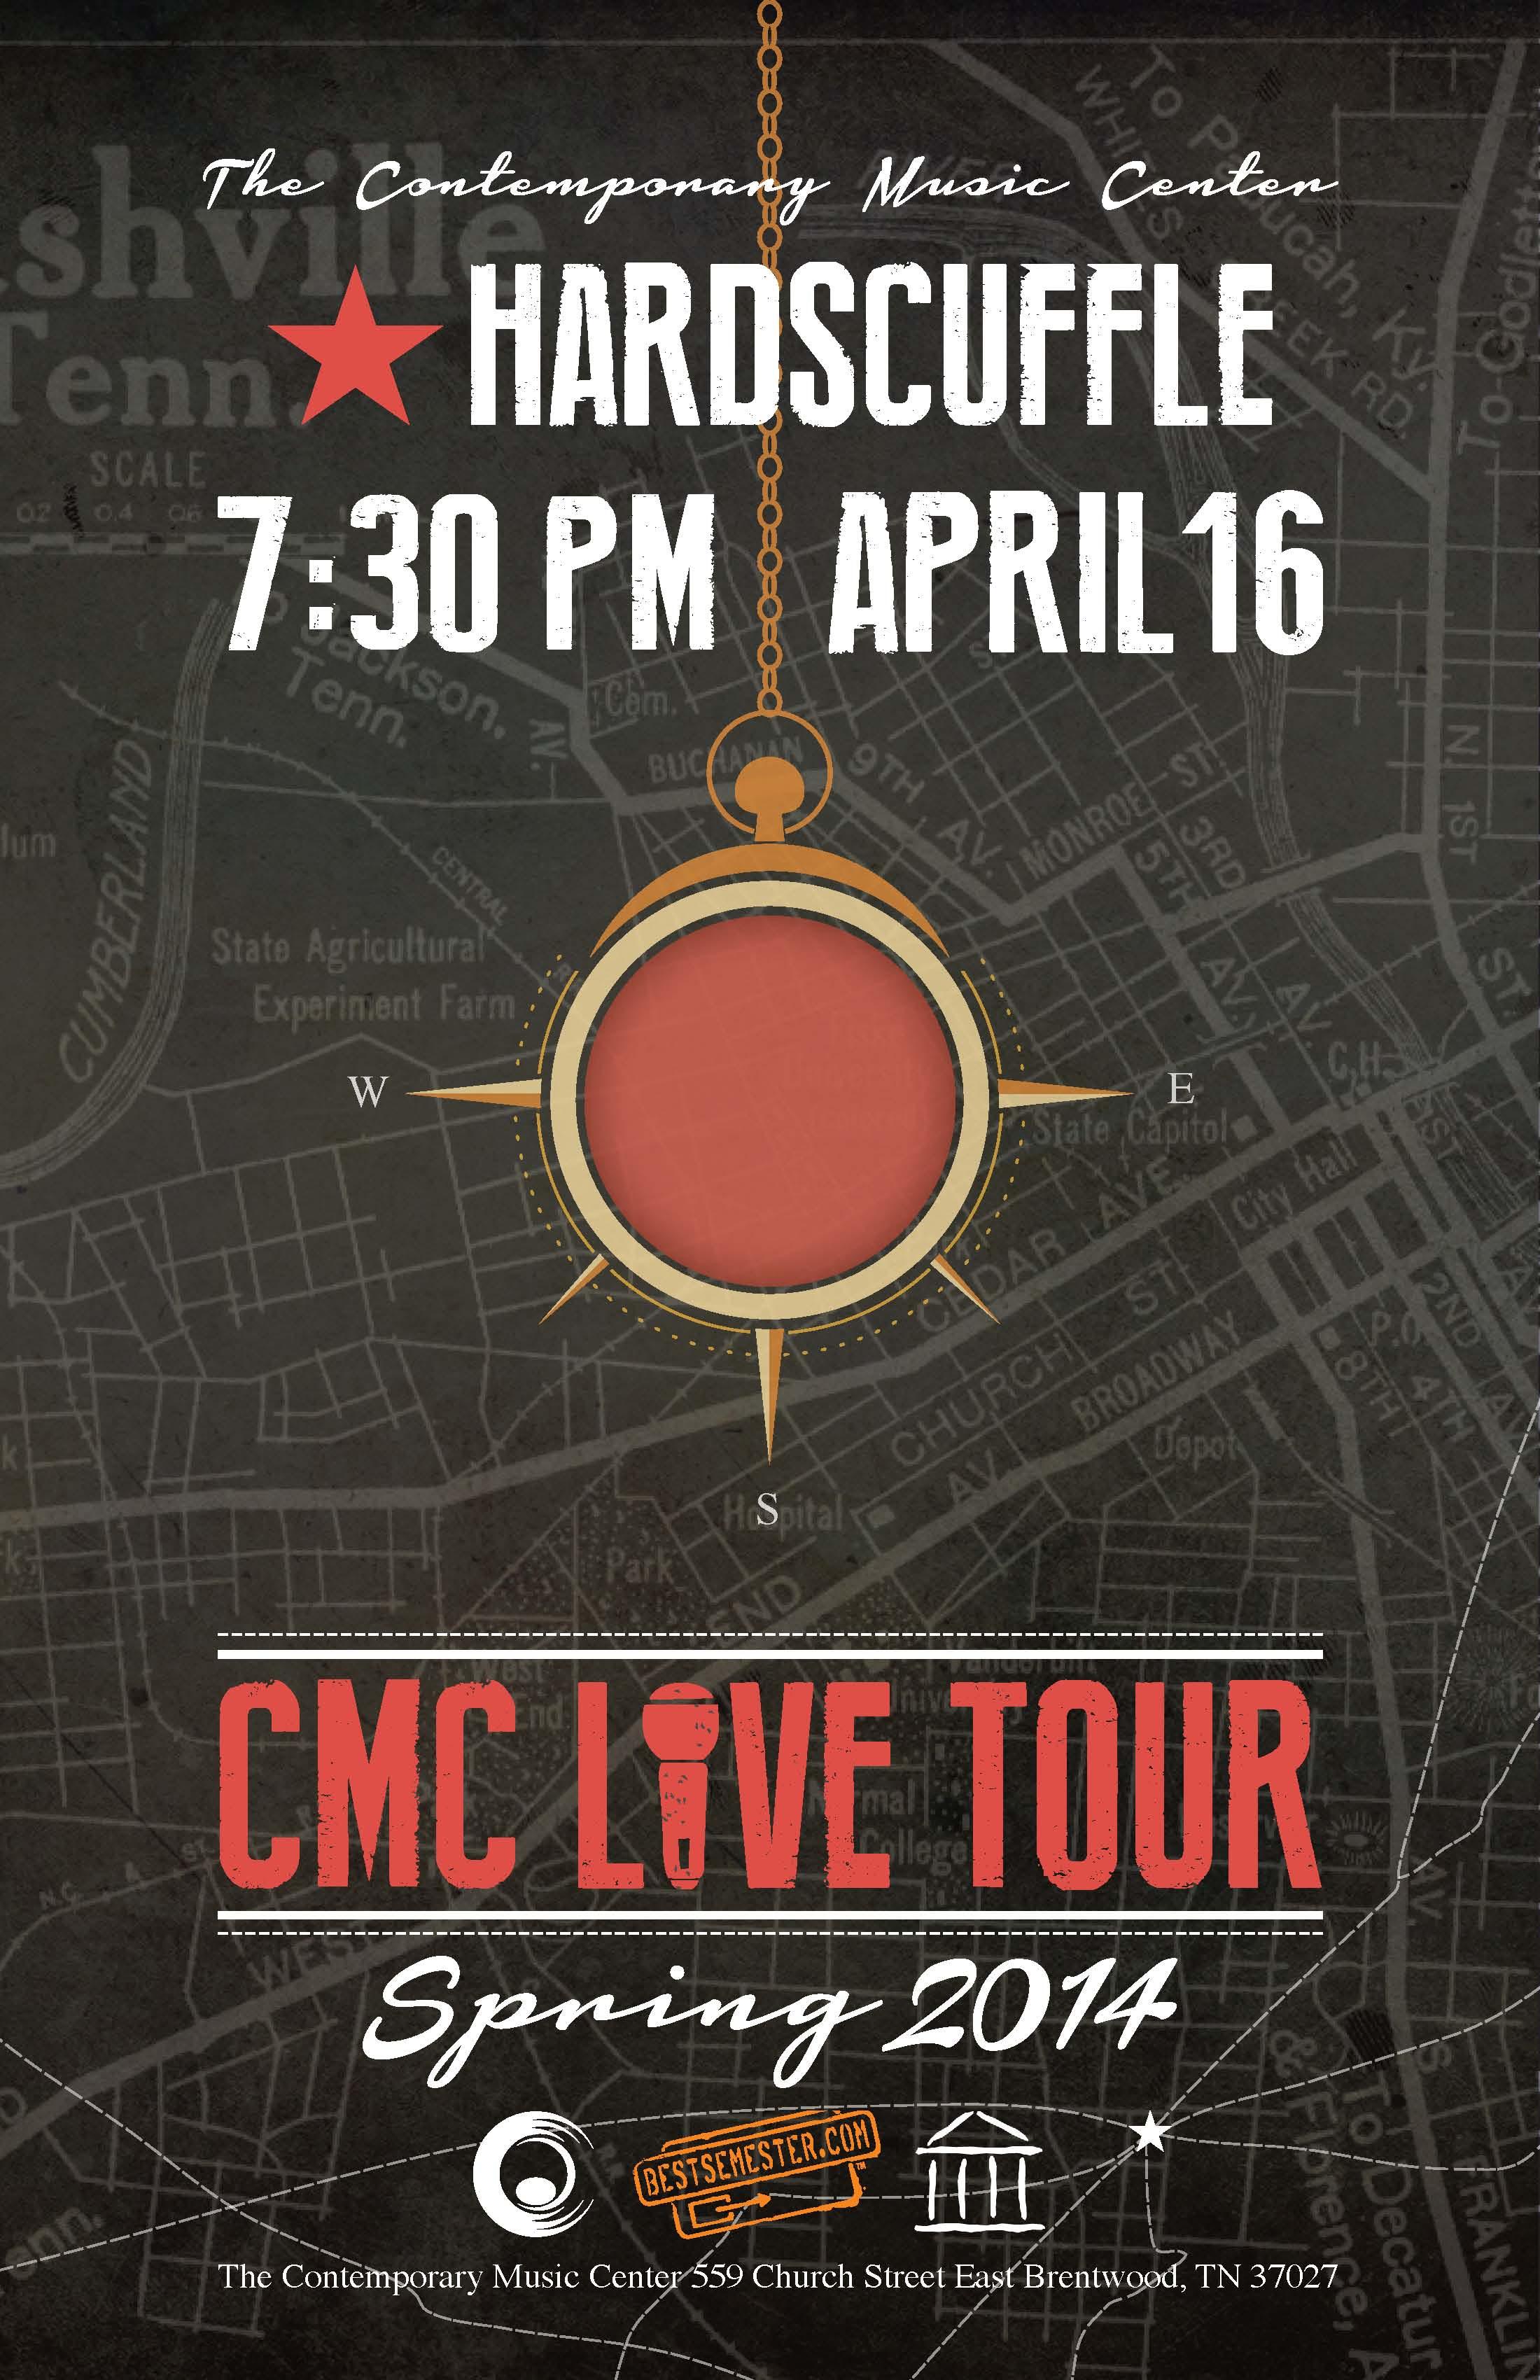 Poster 13 - CMC Live Tour 1